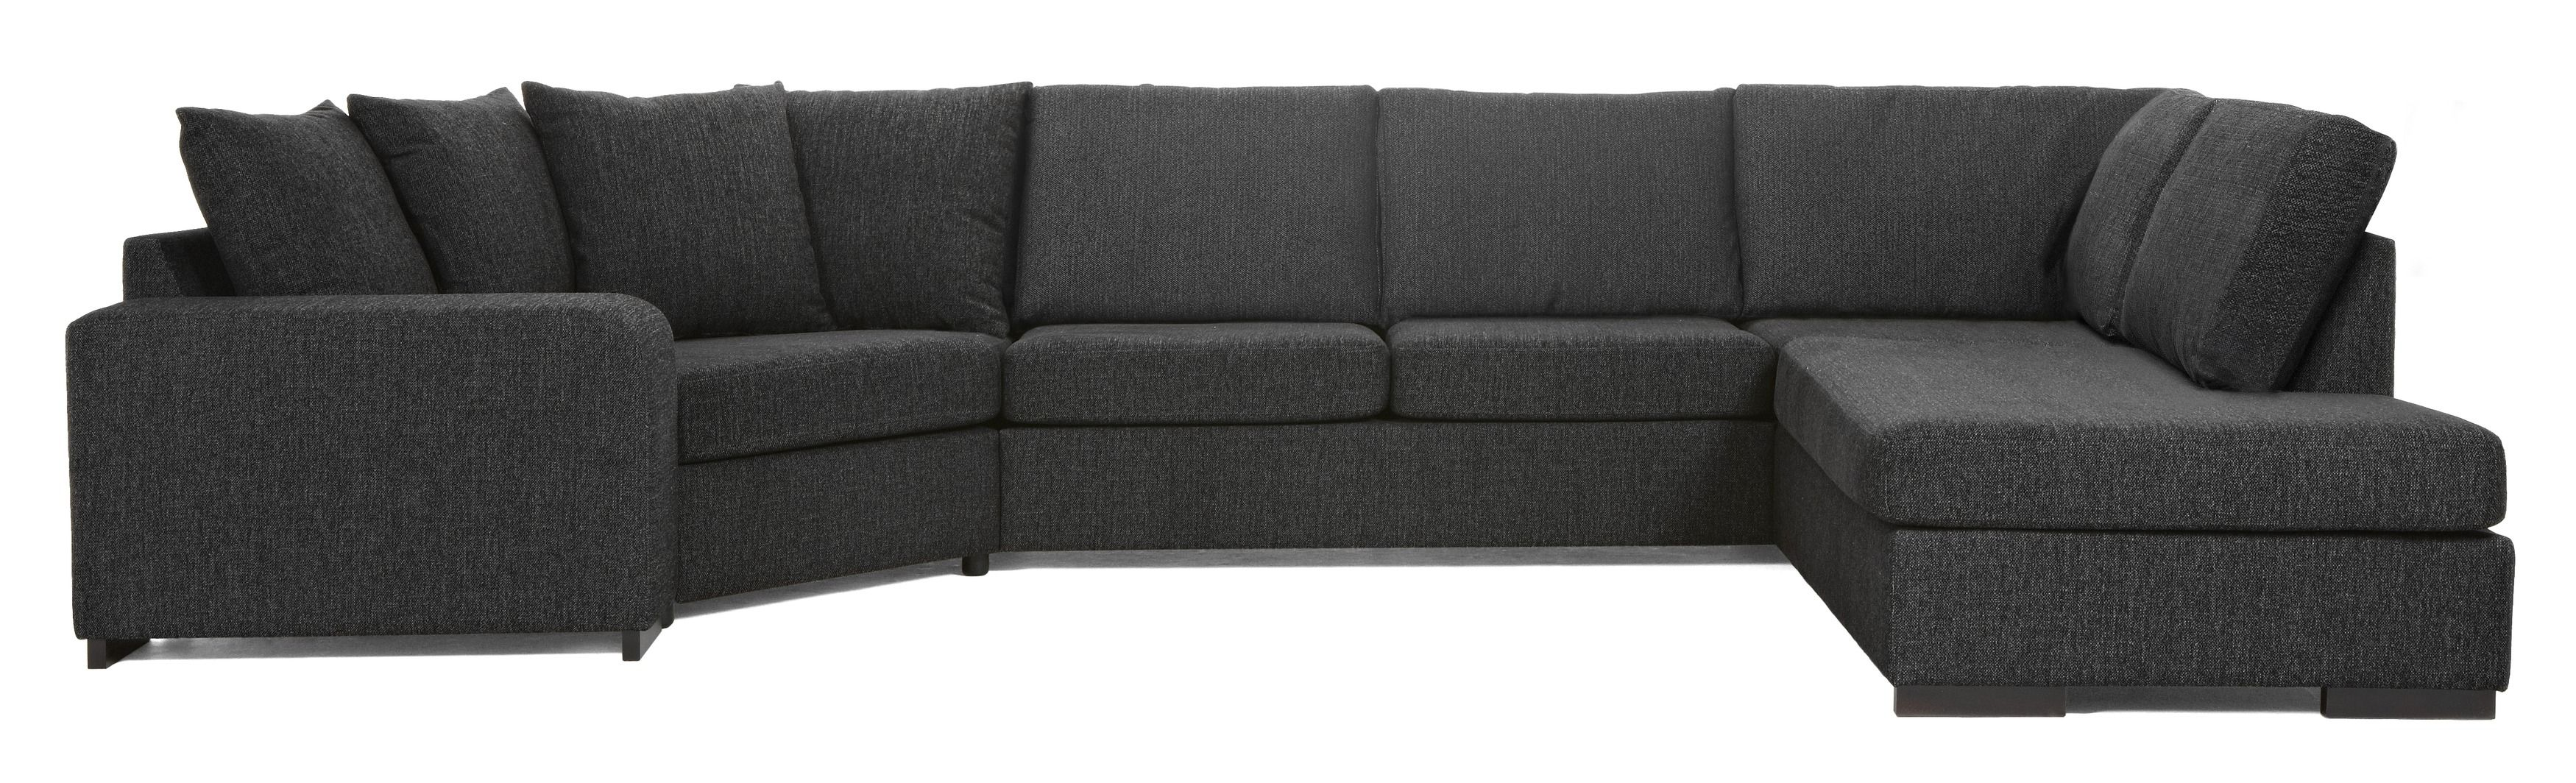 mio soffa divan